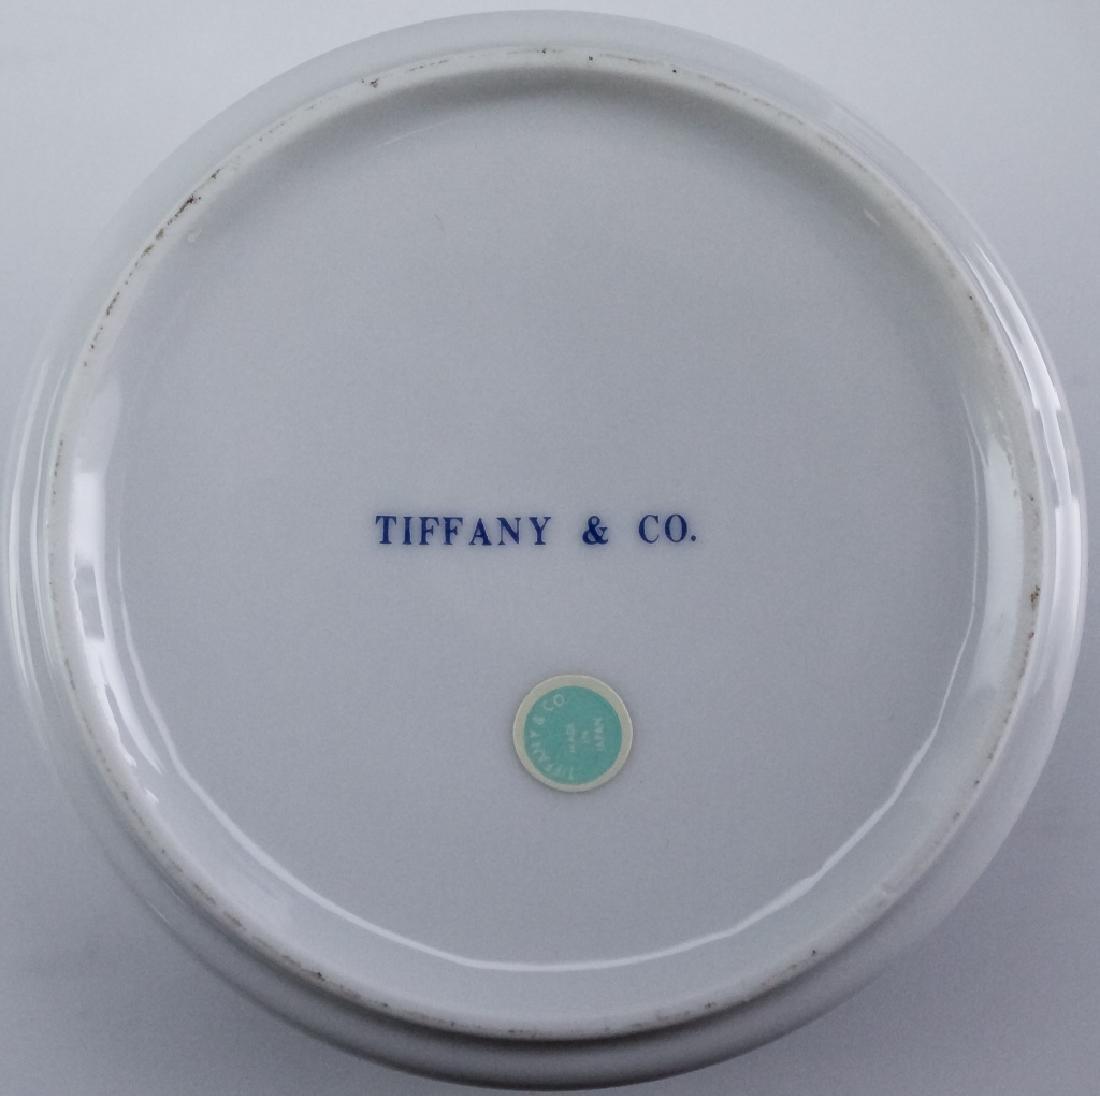 Tiffany & Co. Brass Desk Clock & Porcelain Box - 7